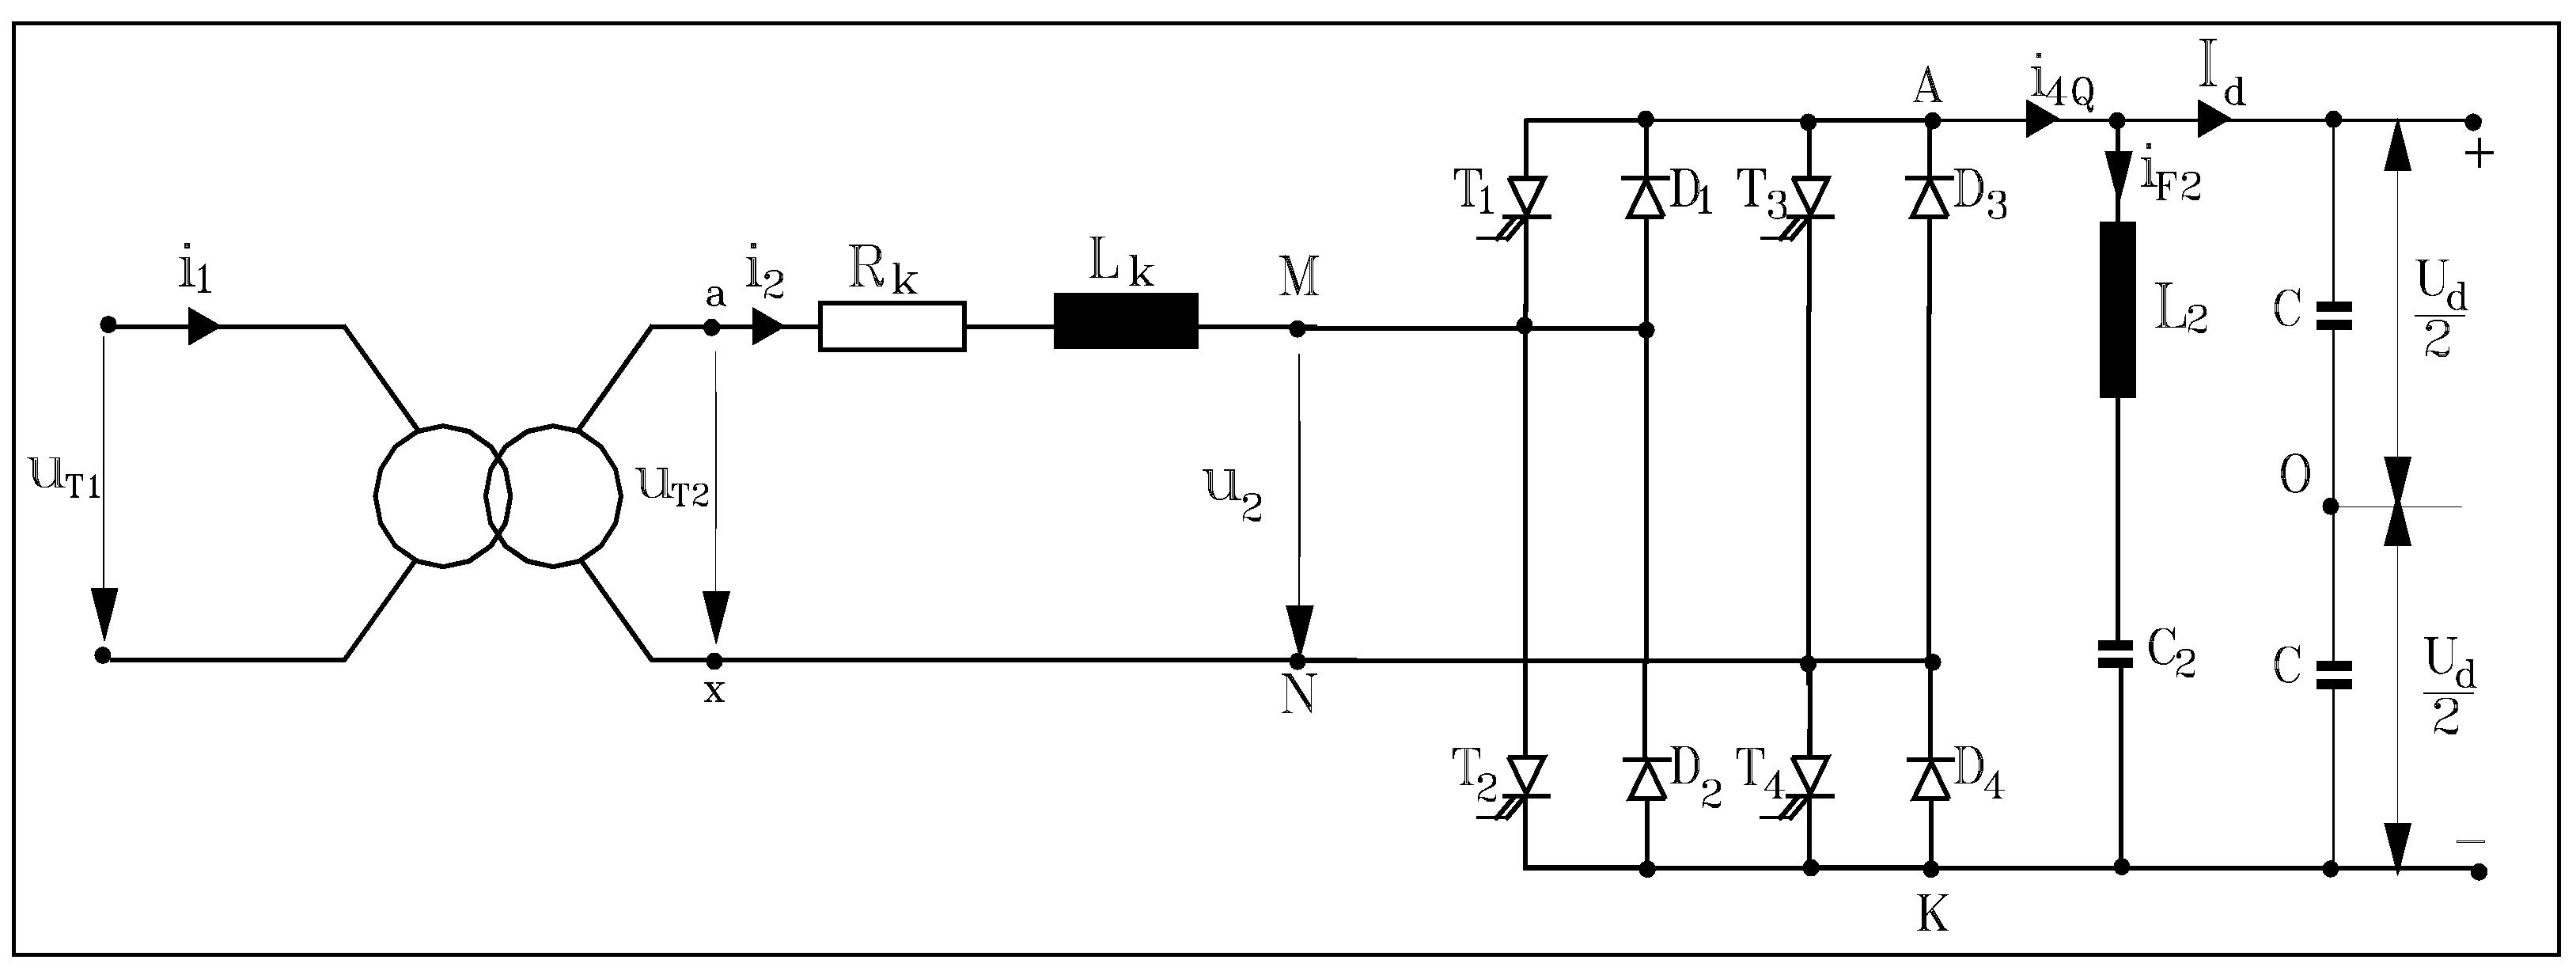 Whelen Siren Speaker Wiring Diagram Whelen Liberty Wiring